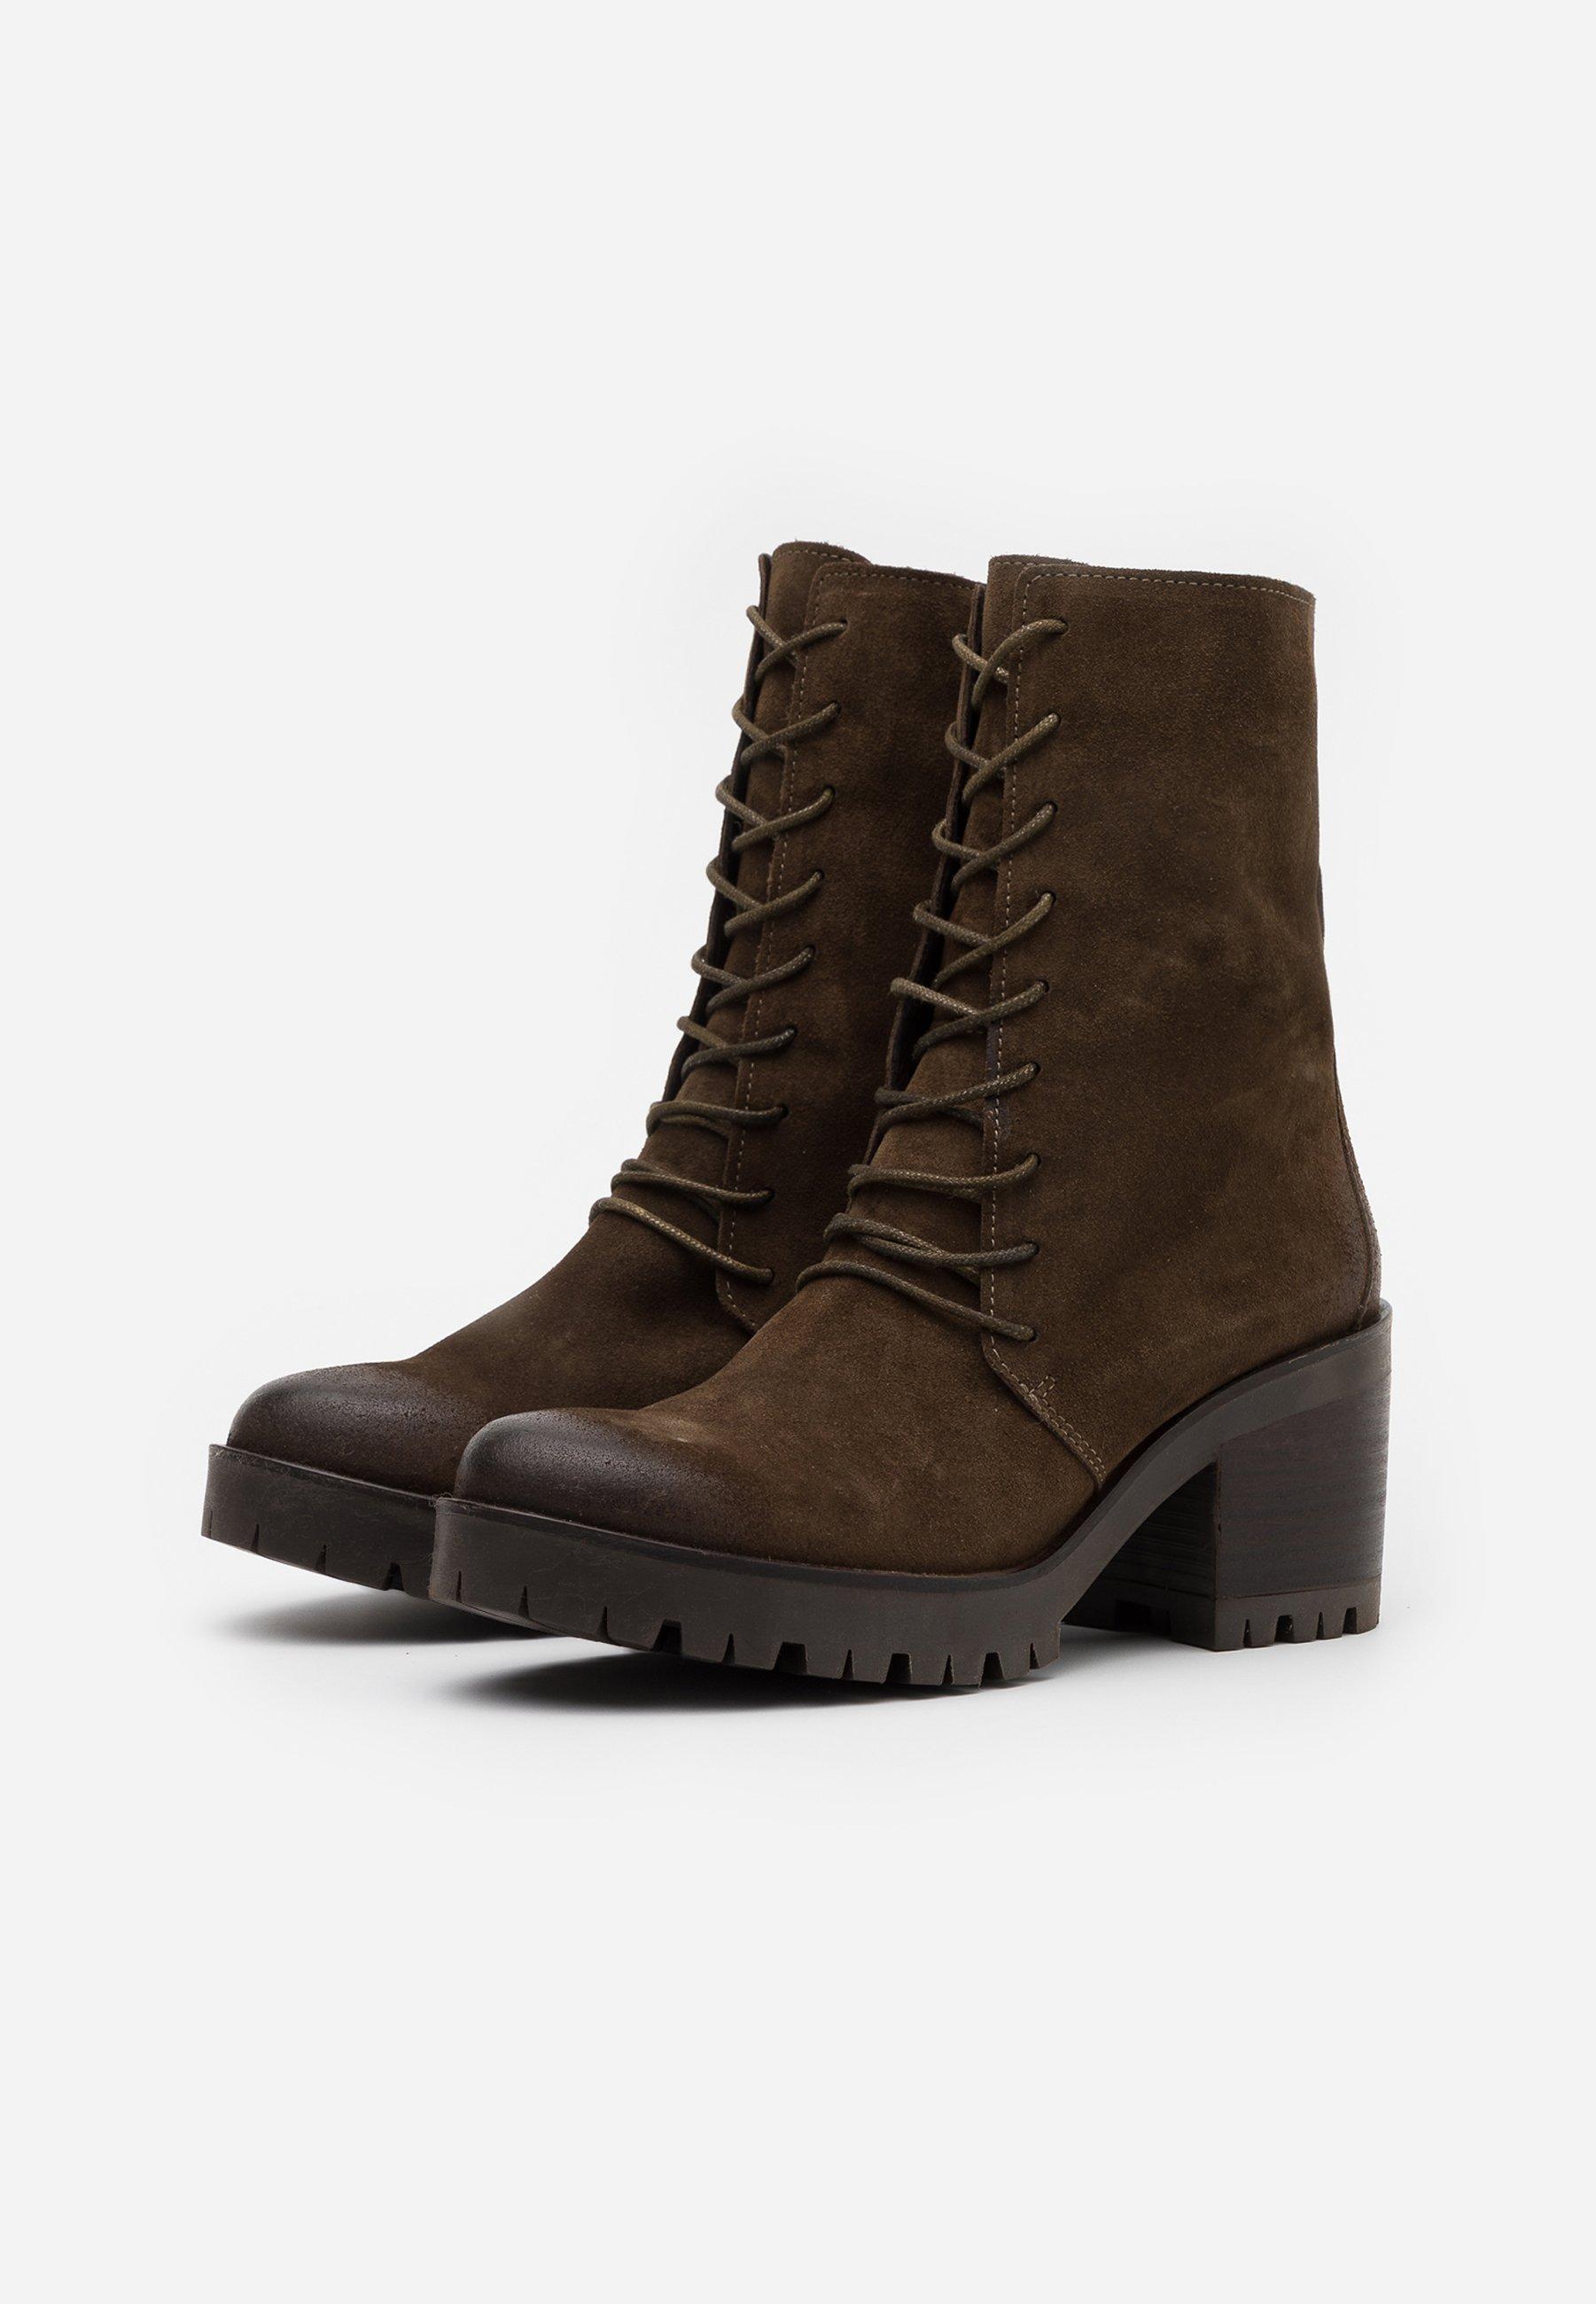 Felmini COSMO - Platform-nilkkurit - marvin olive - Naisten kengät LldXt